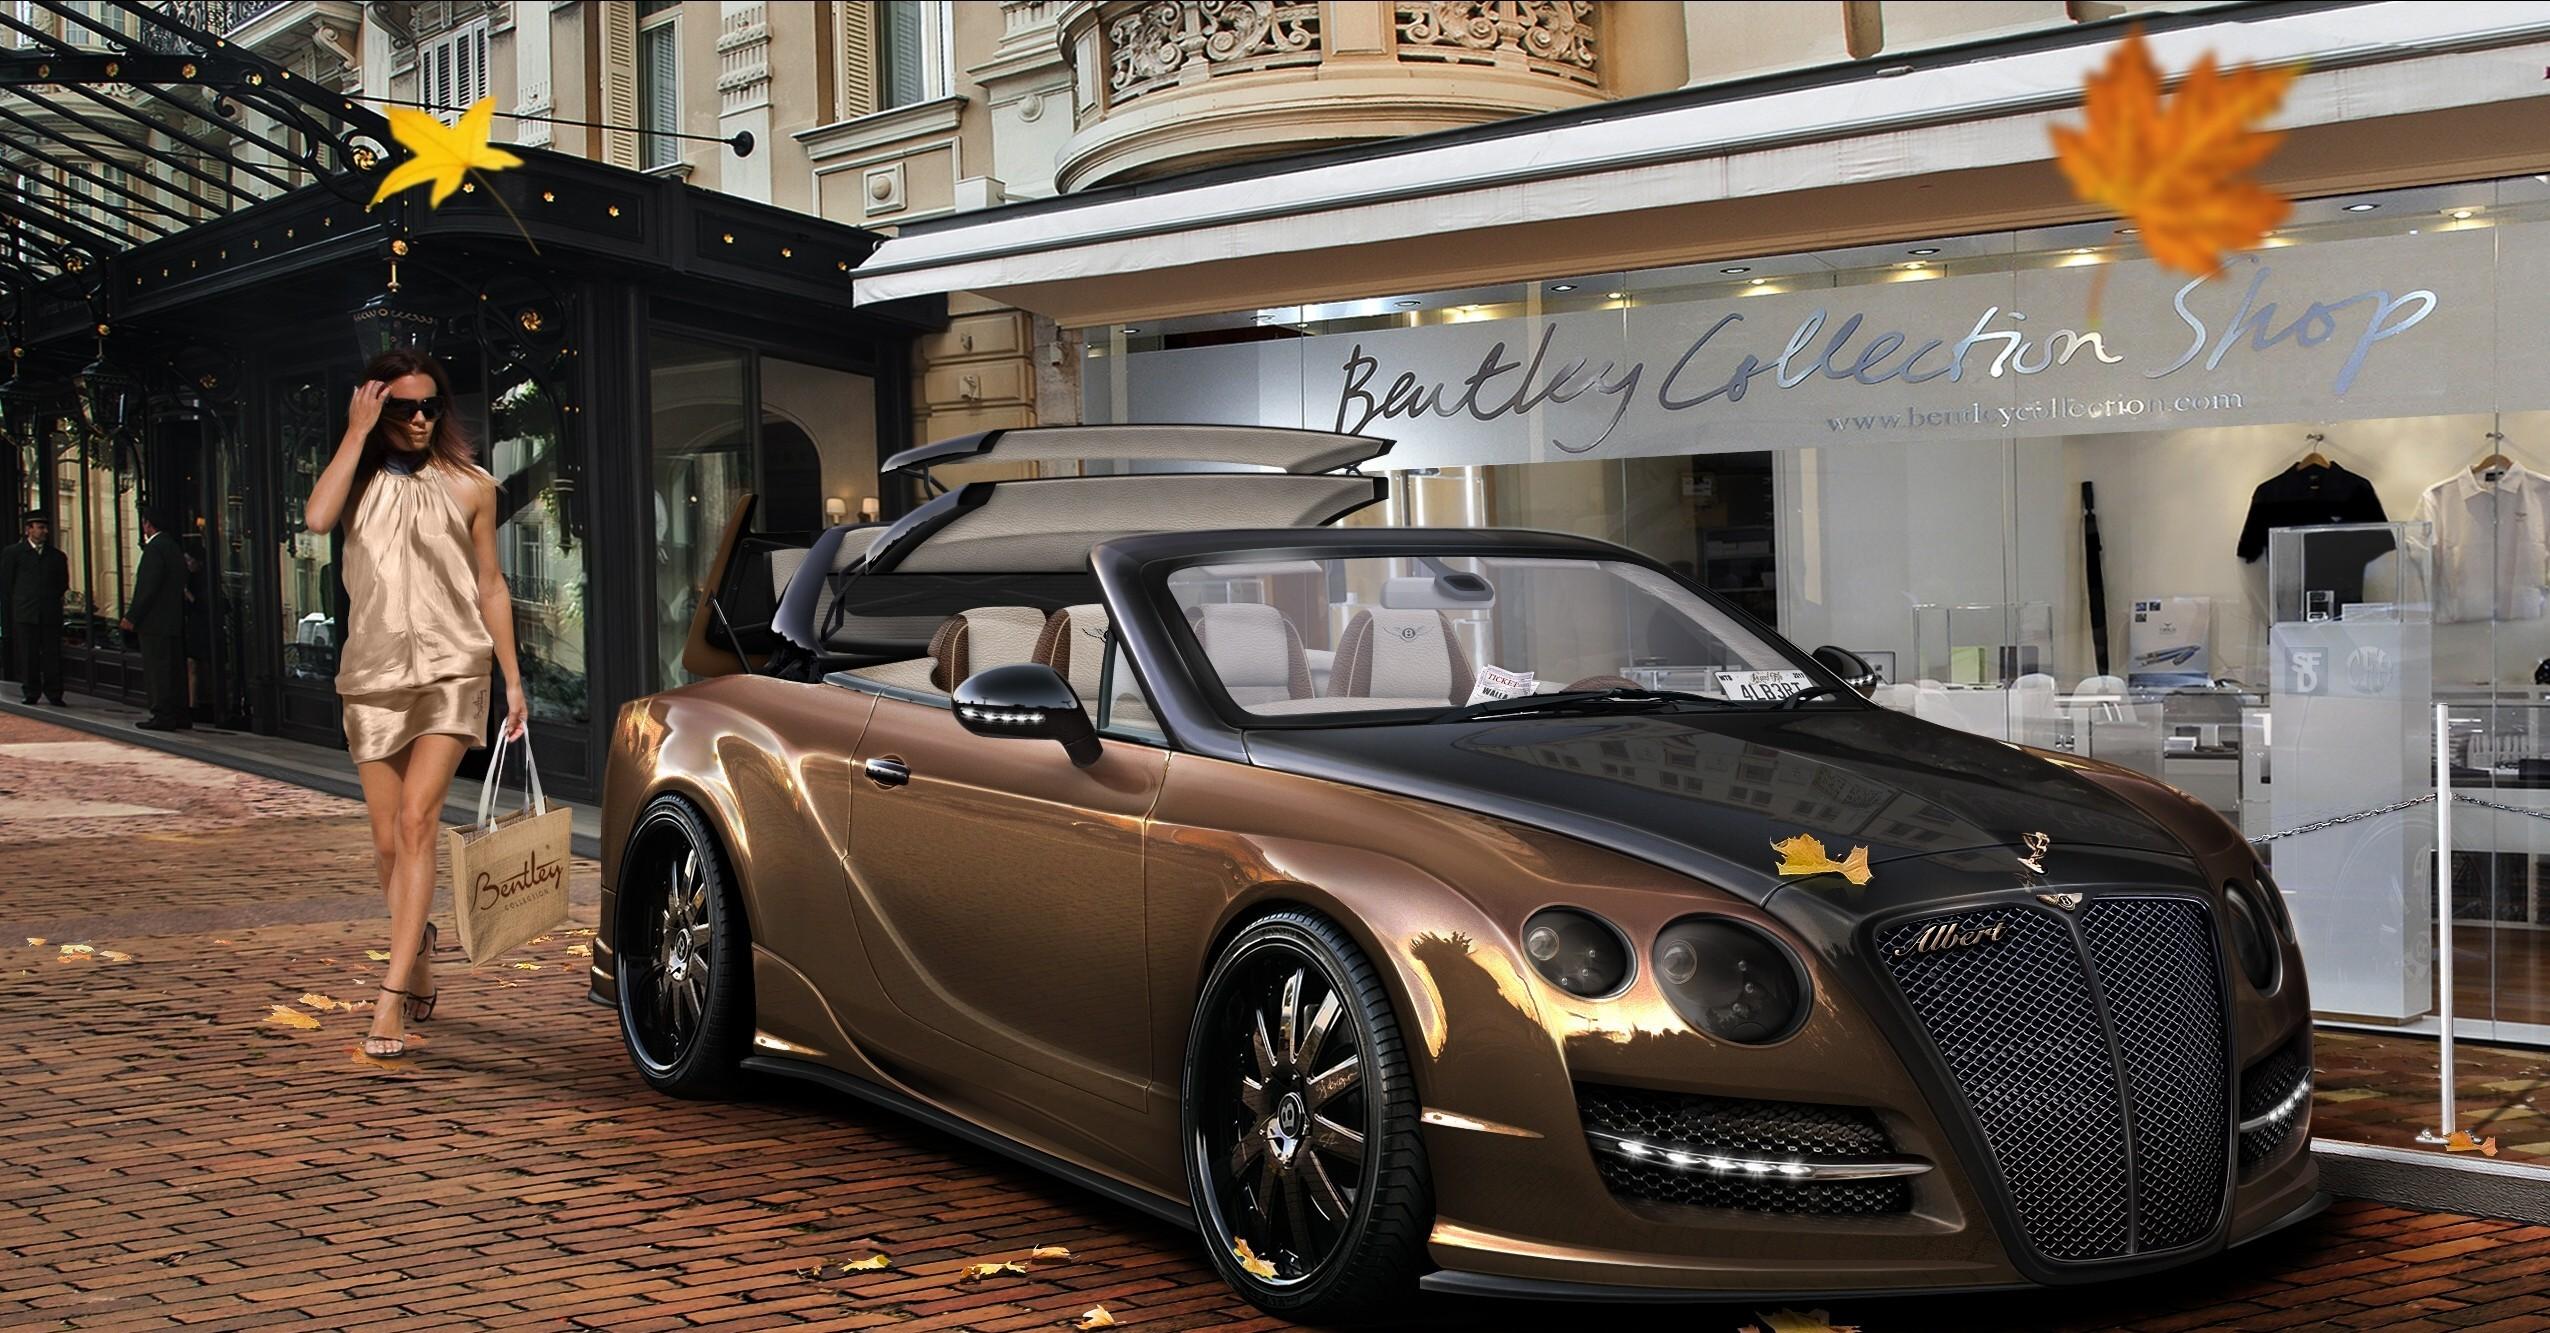 Bentley Continental Gt Convertible Hd Wallpaper